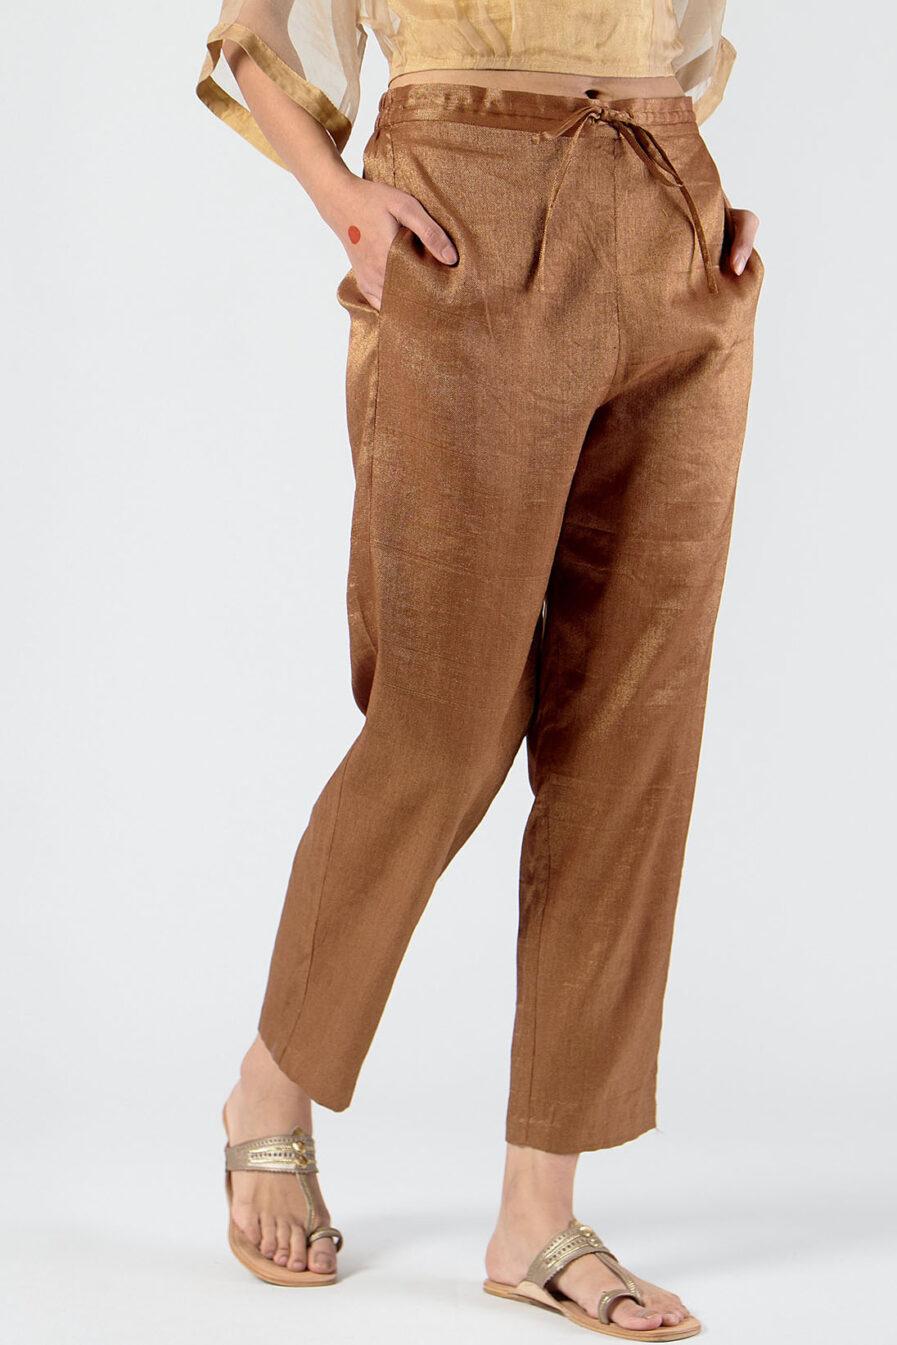 Anavila Metallic trouser